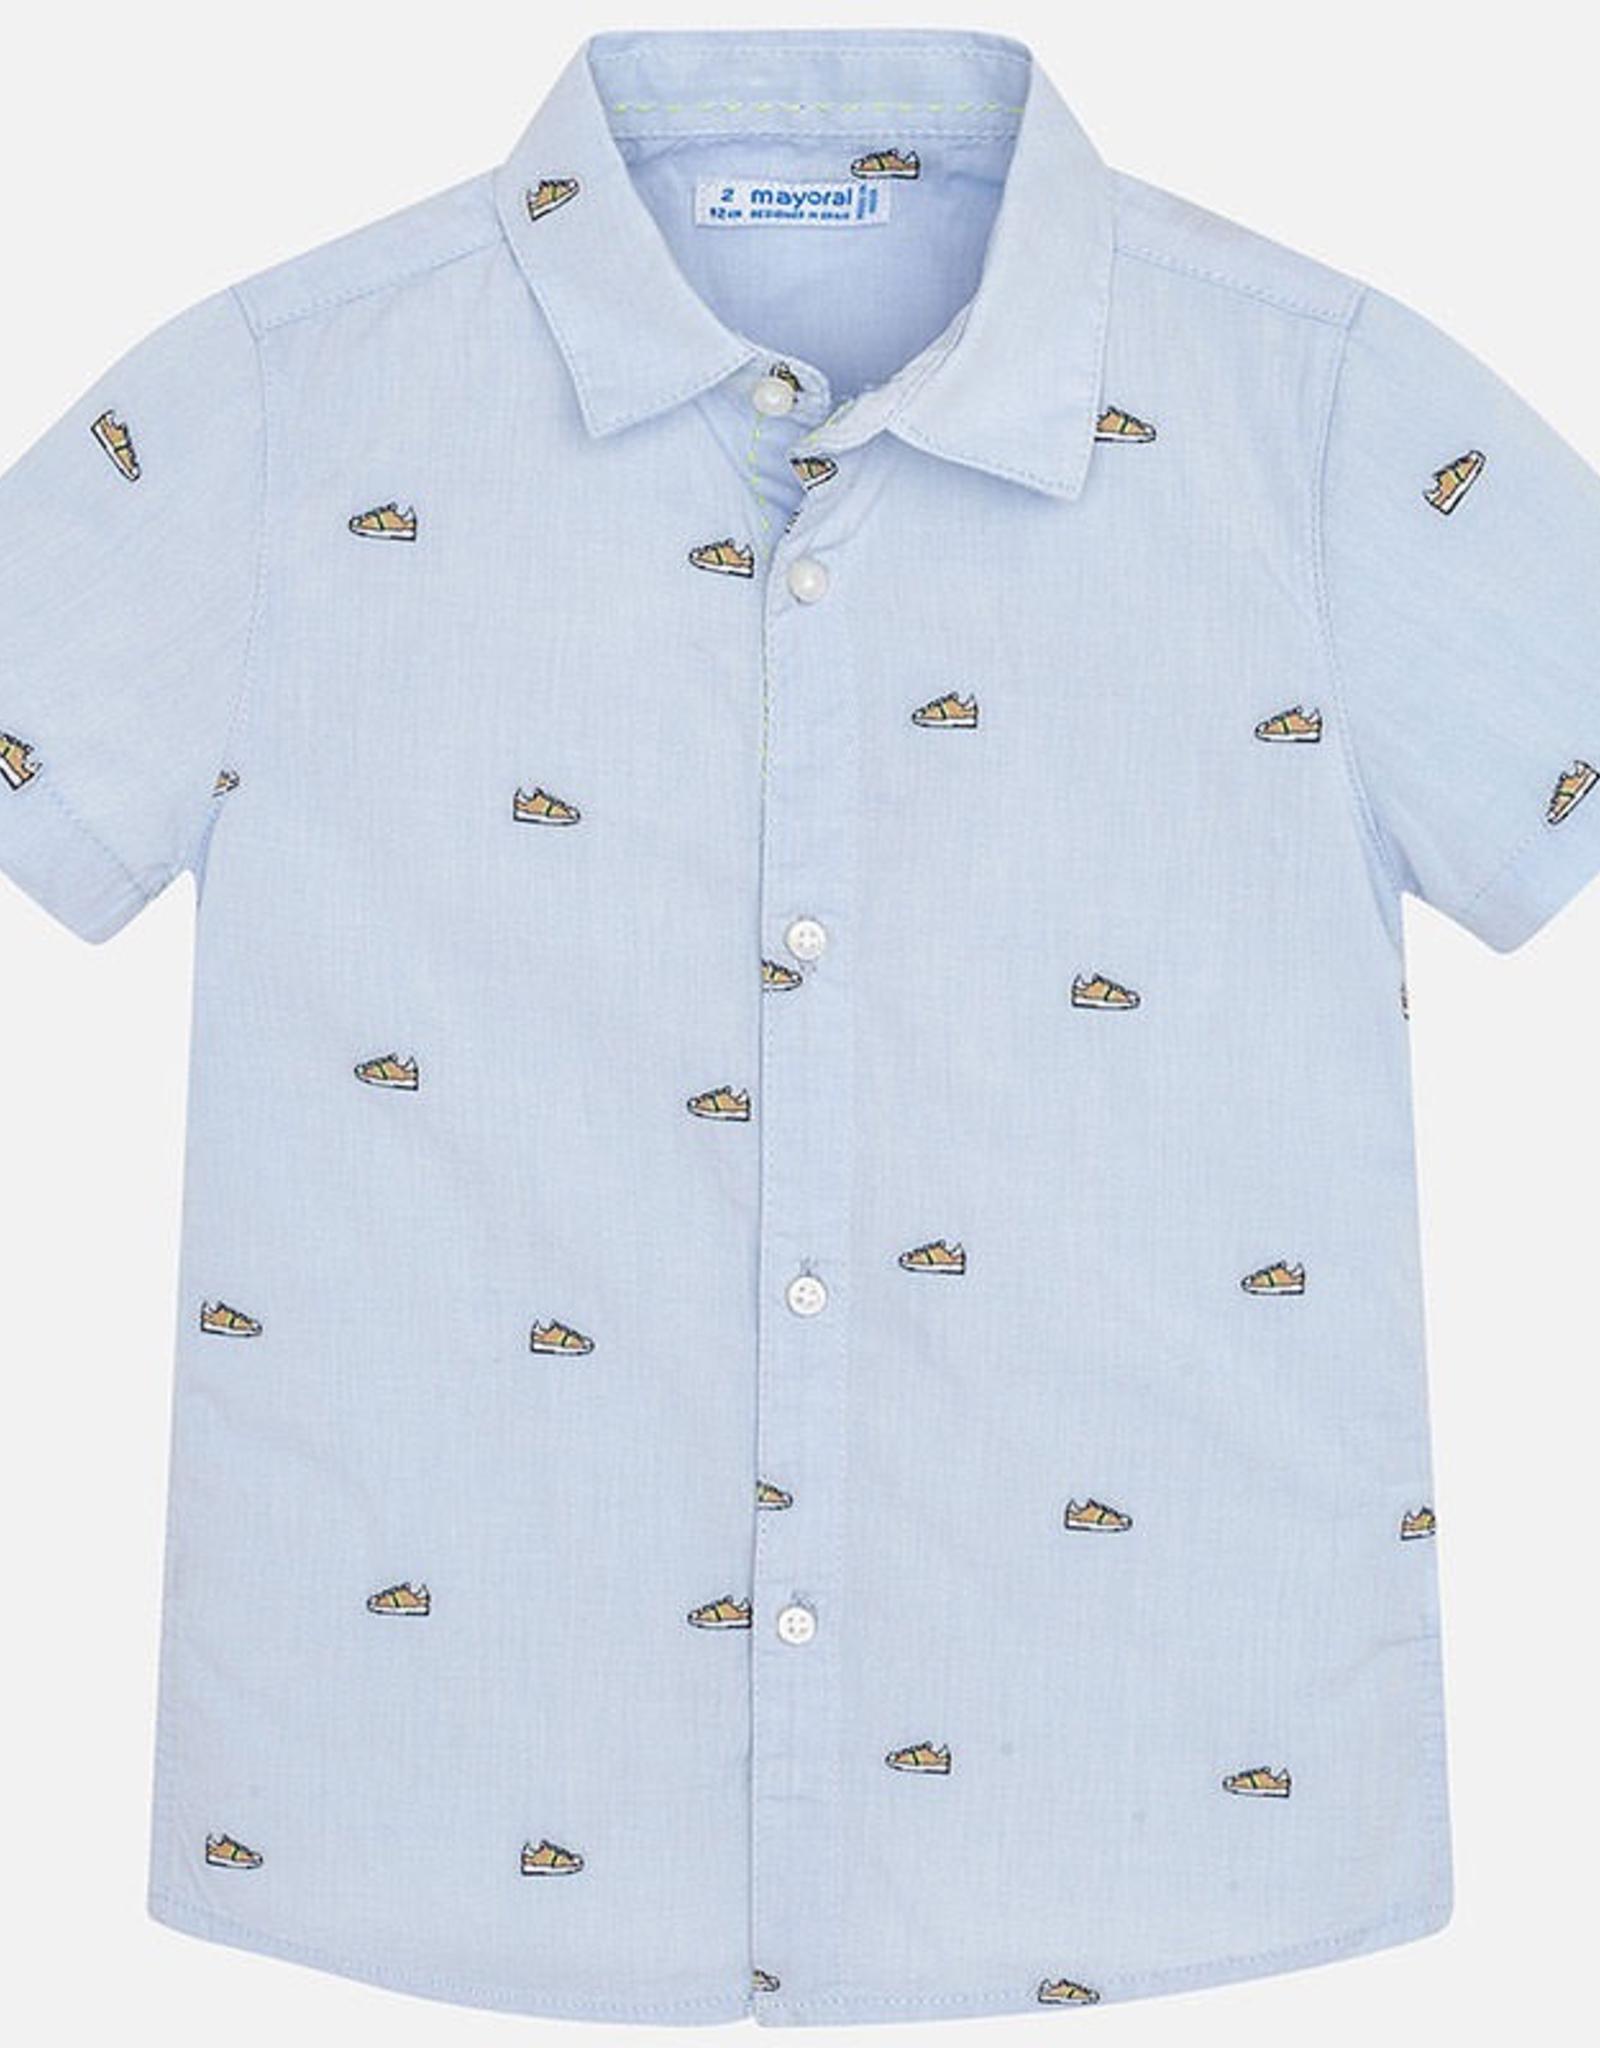 Mayoral Sneaker Print Button Down Short Sleeved Shirt boy